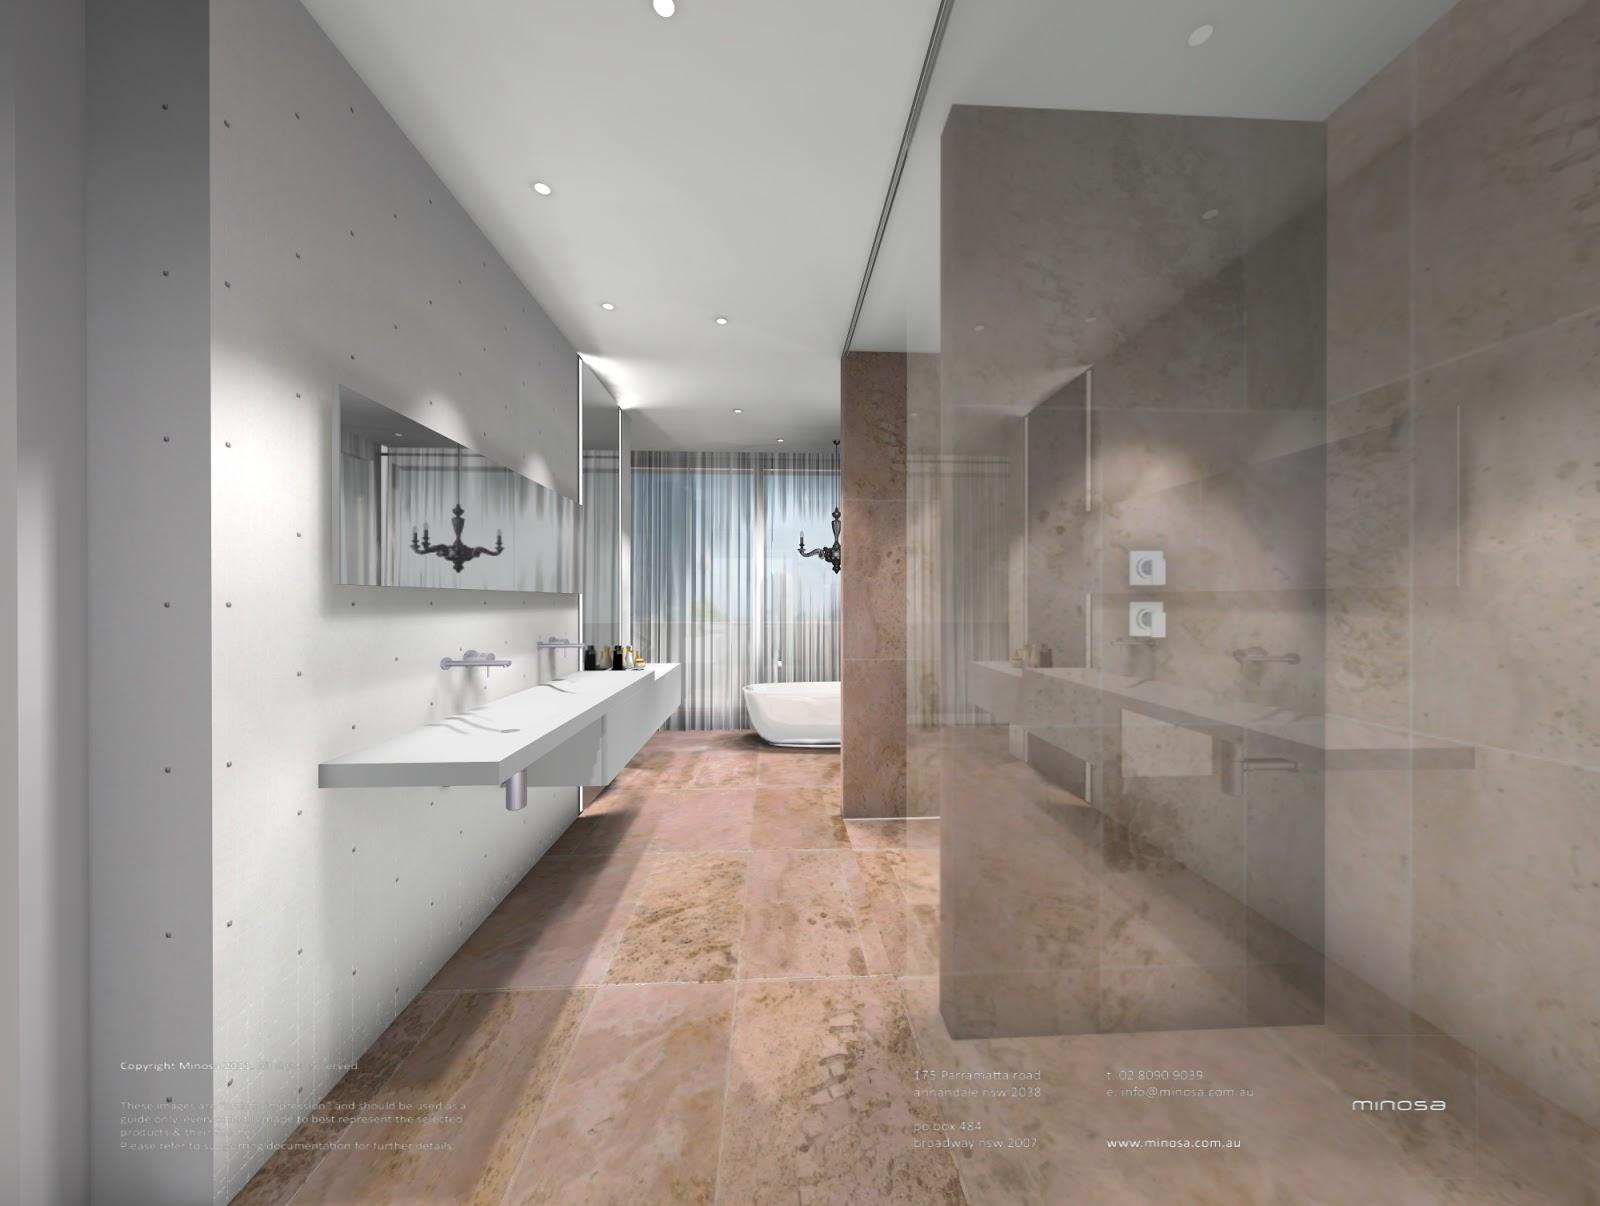 Minosa New Minosa Bathroom Design Resort Style Ensuite